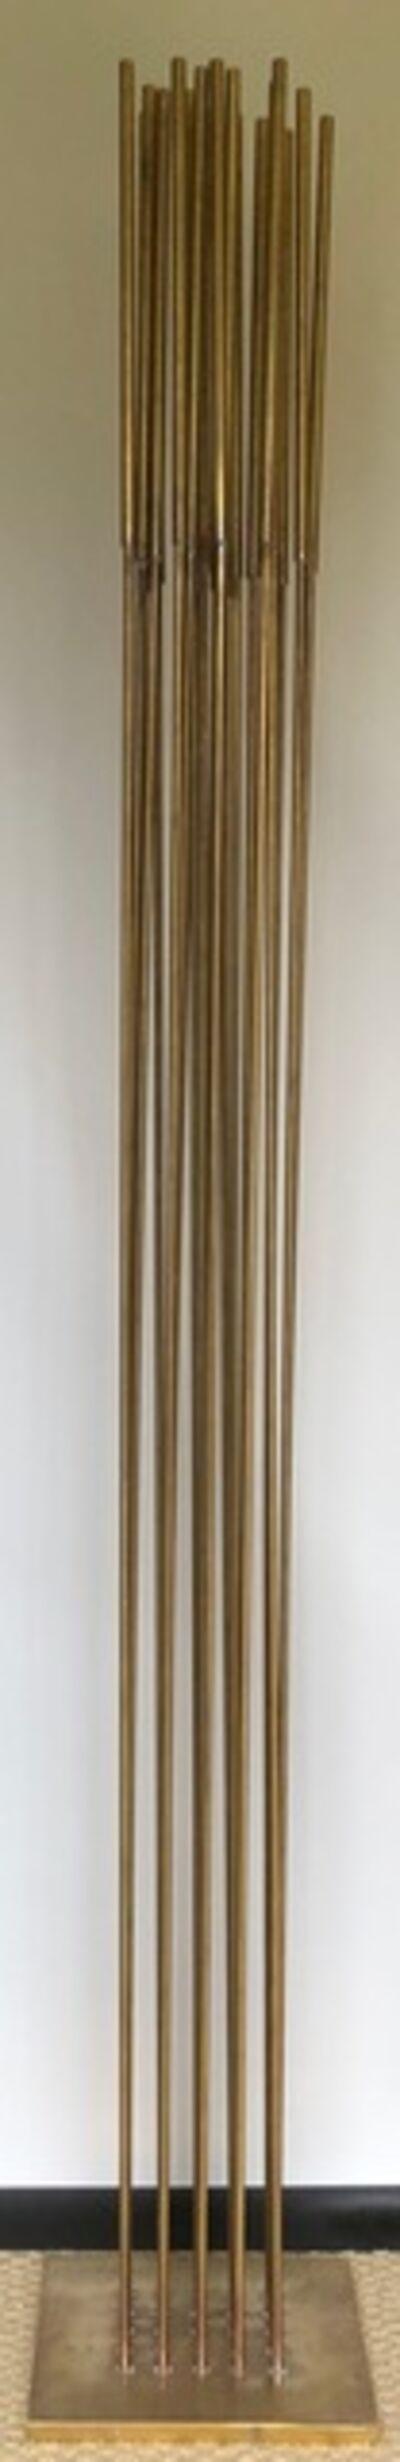 Harry Bertoia, 'Sonambient', ca. 1974